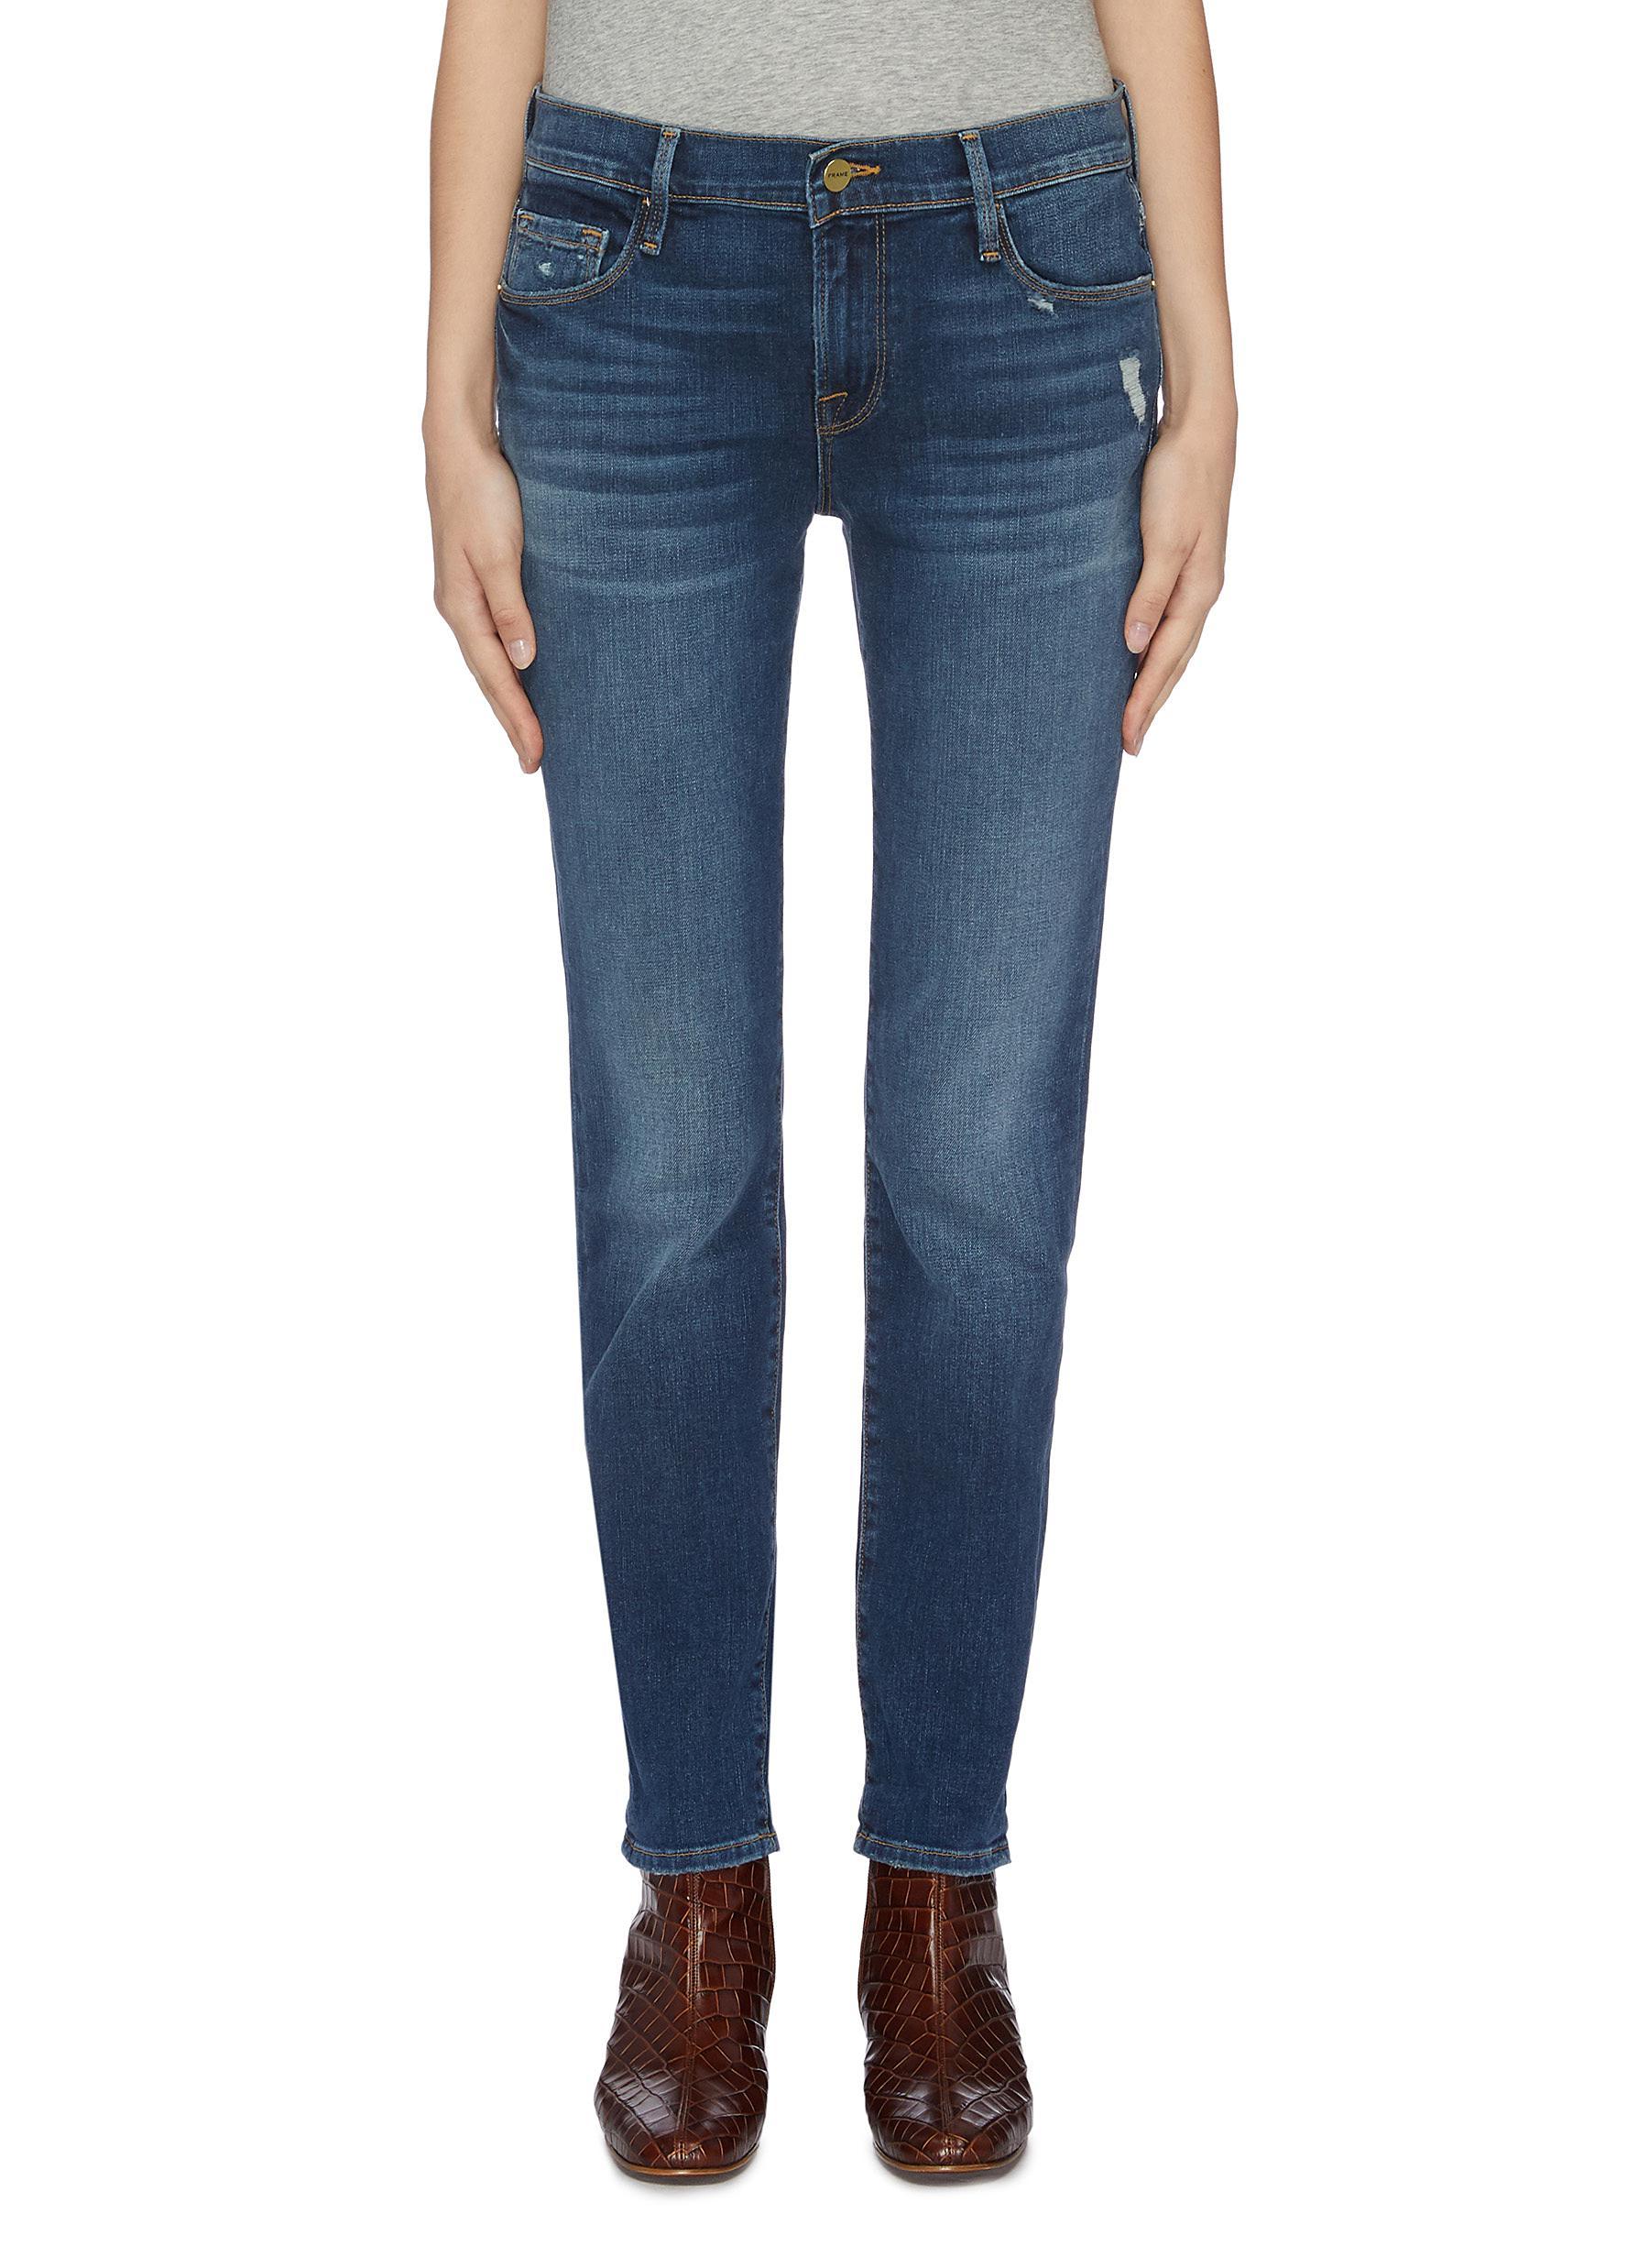 Buy Frame Denim Jeans 'Le Garcon' jeans